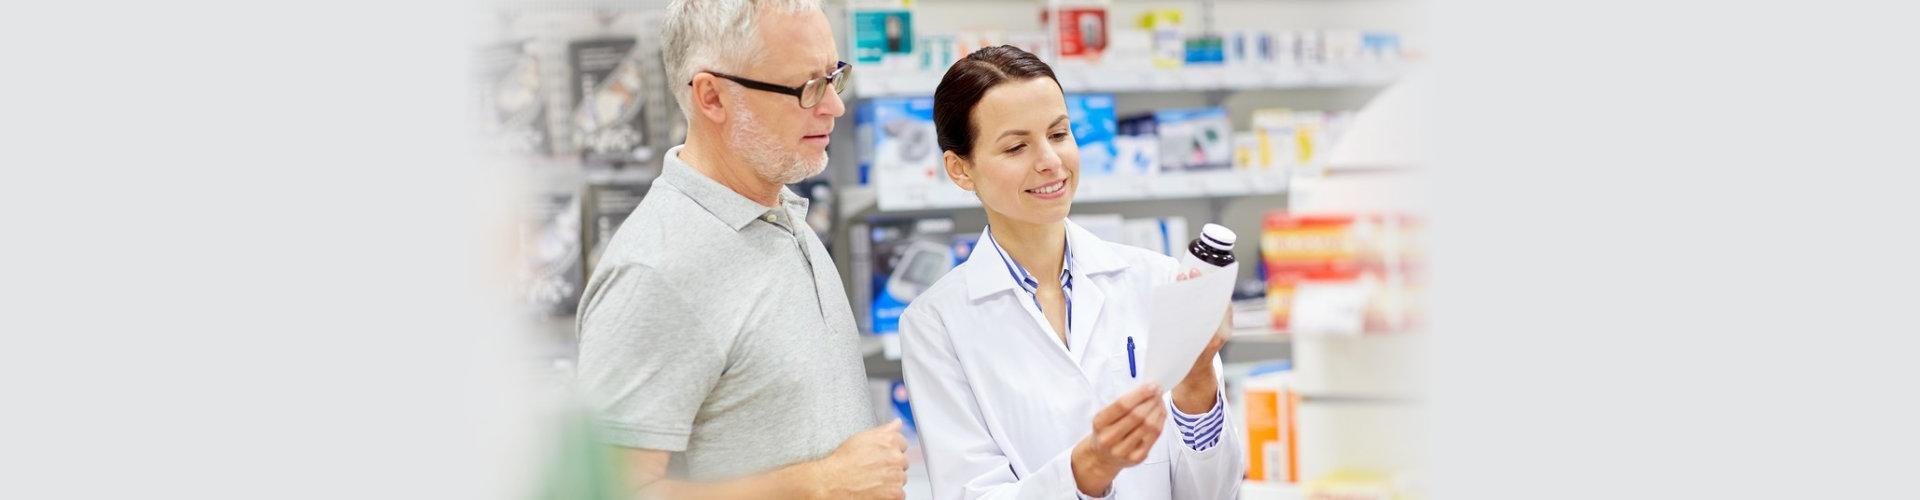 pharmacist and senior